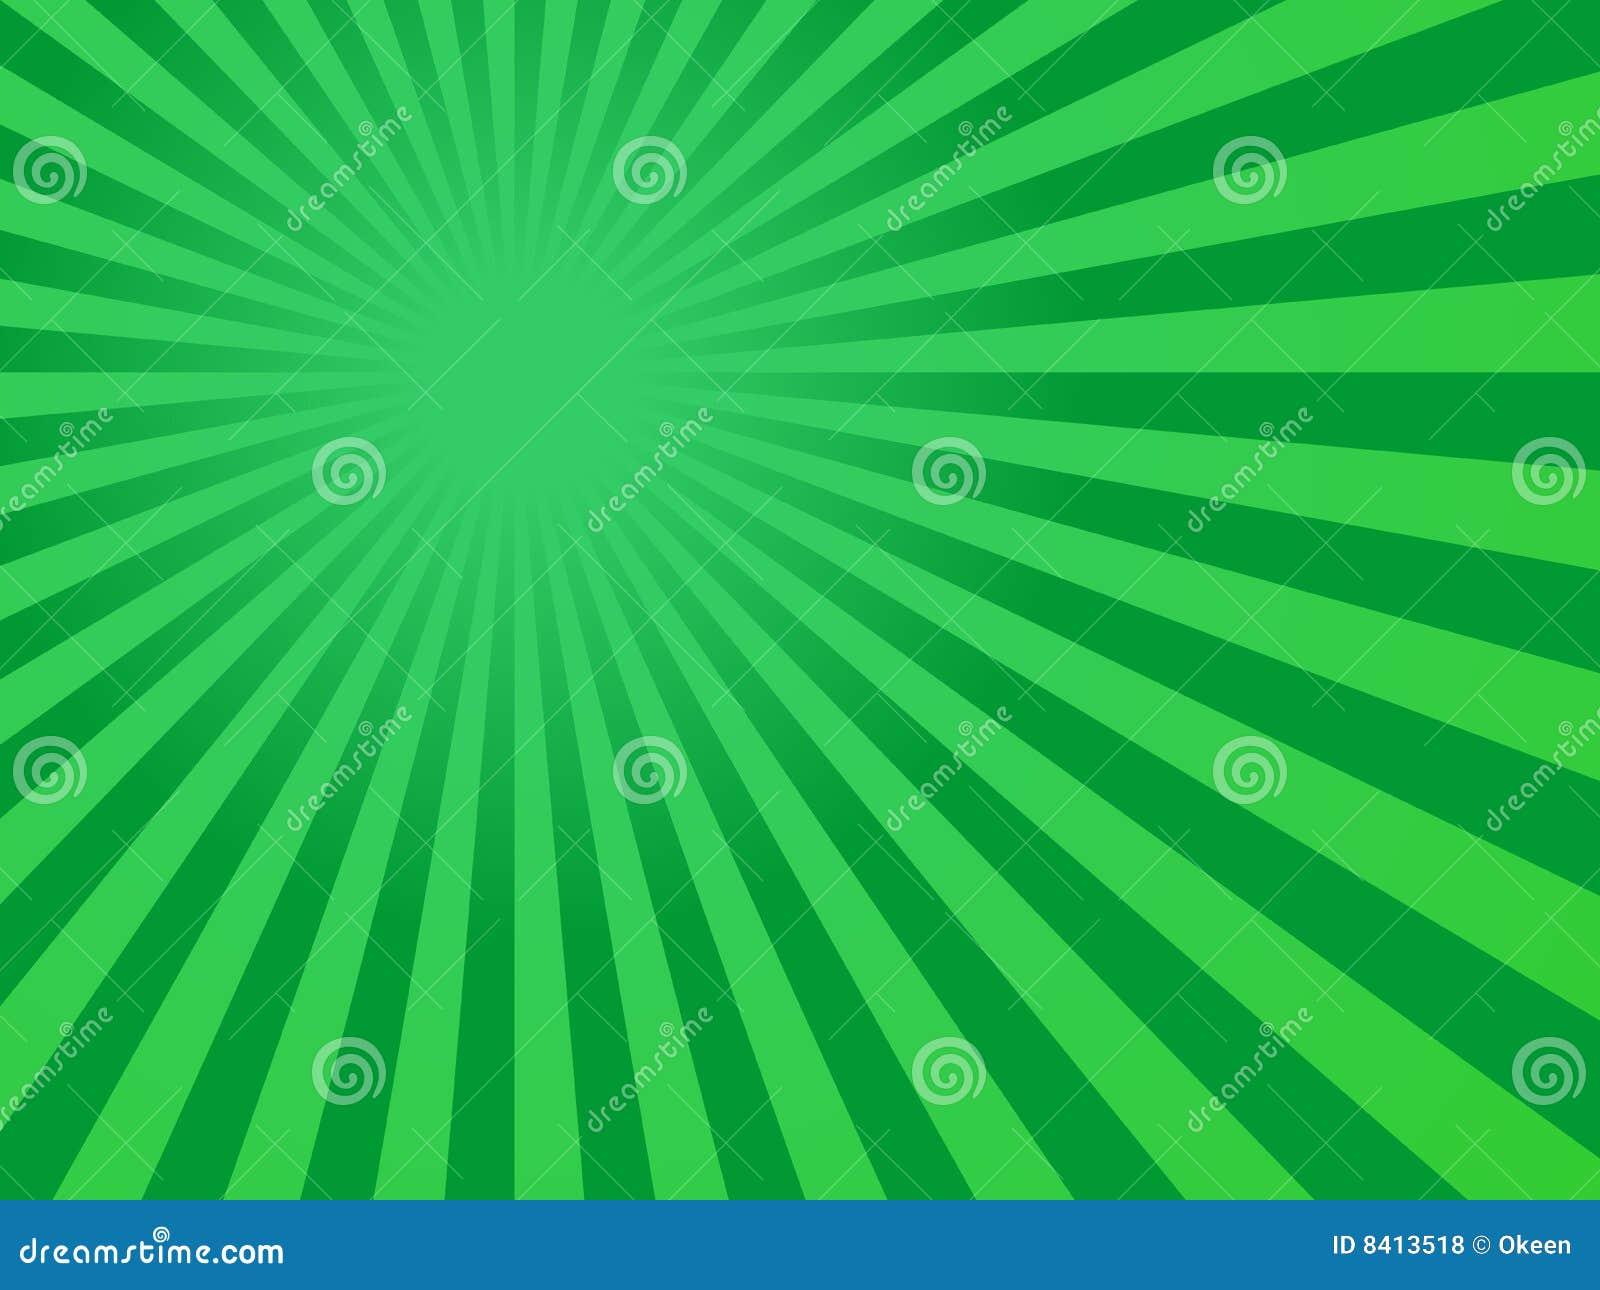 green rays background - photo #12